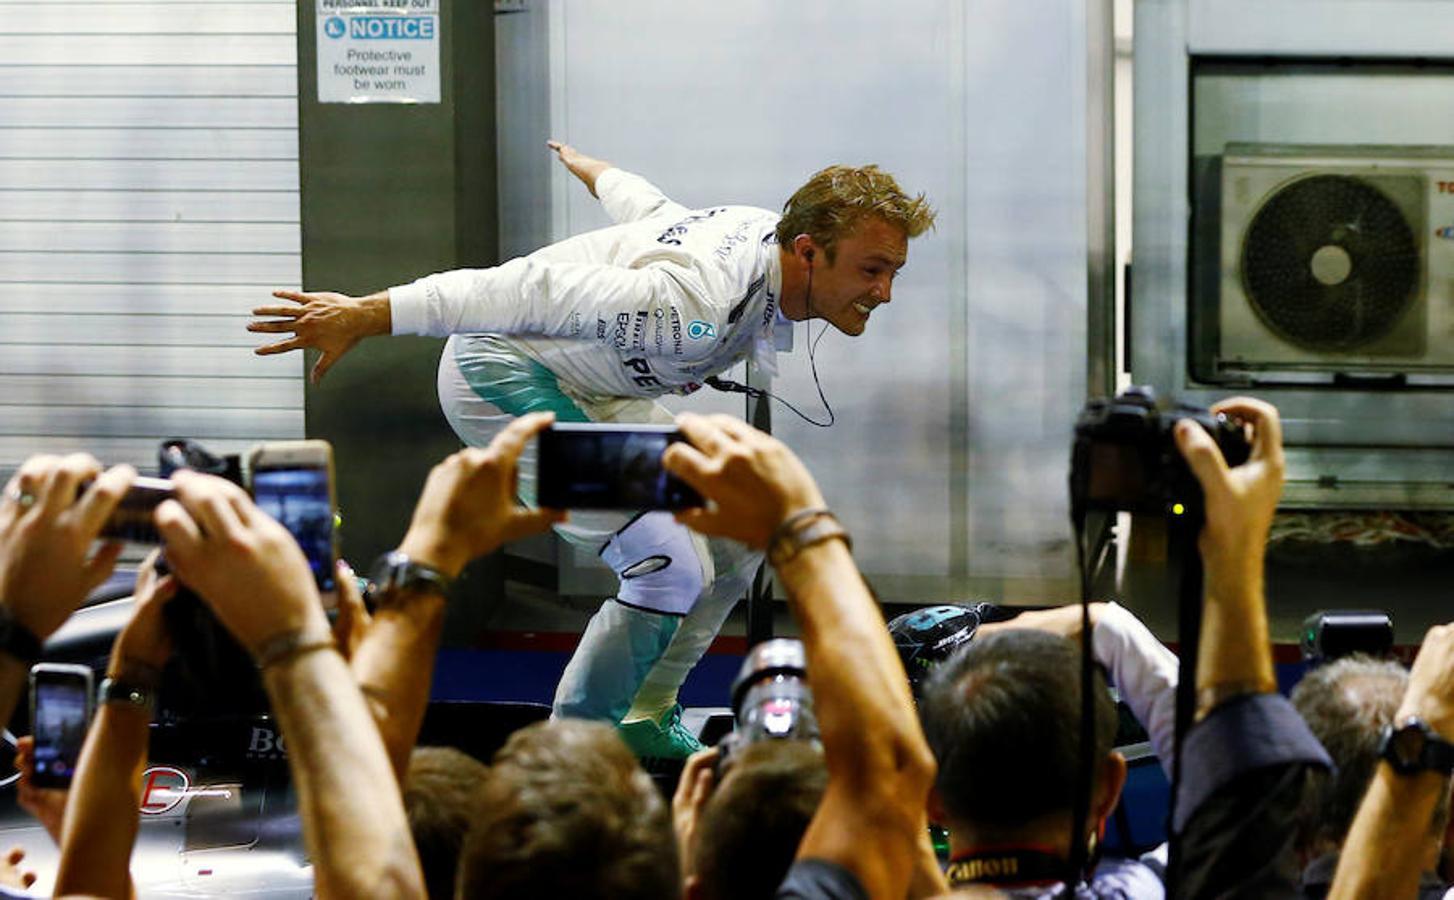 Fórmula 1 | Gran Premio de Singapur:  Alonso exprime Singapur